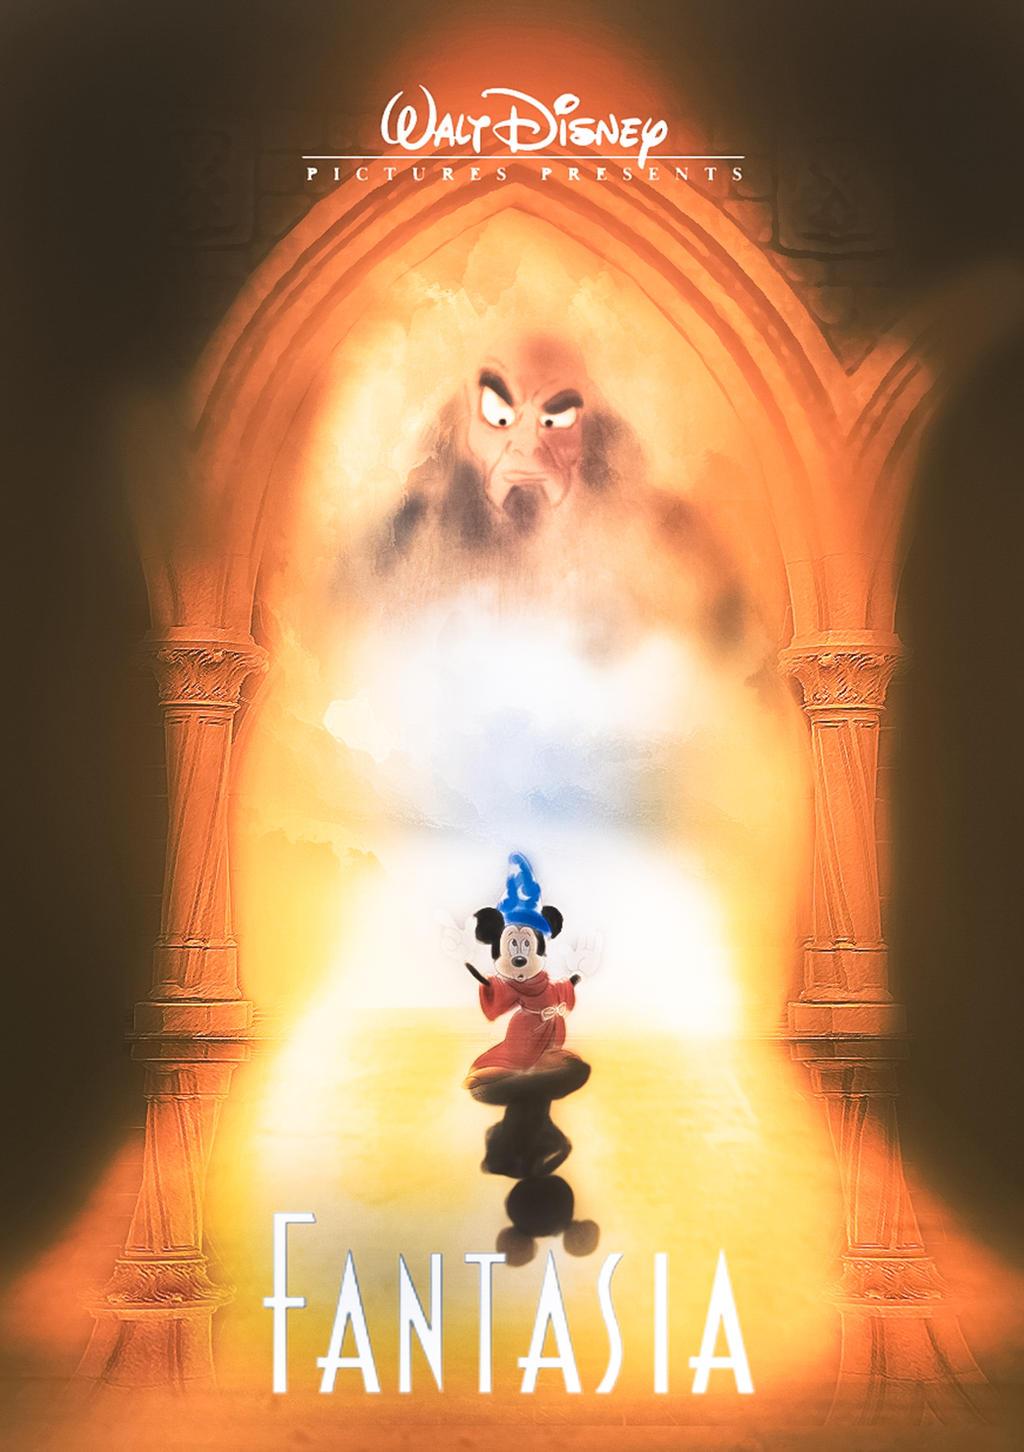 Disney S Fantasia Fanmade Poster By Jonathanjohansson89 On Deviantart